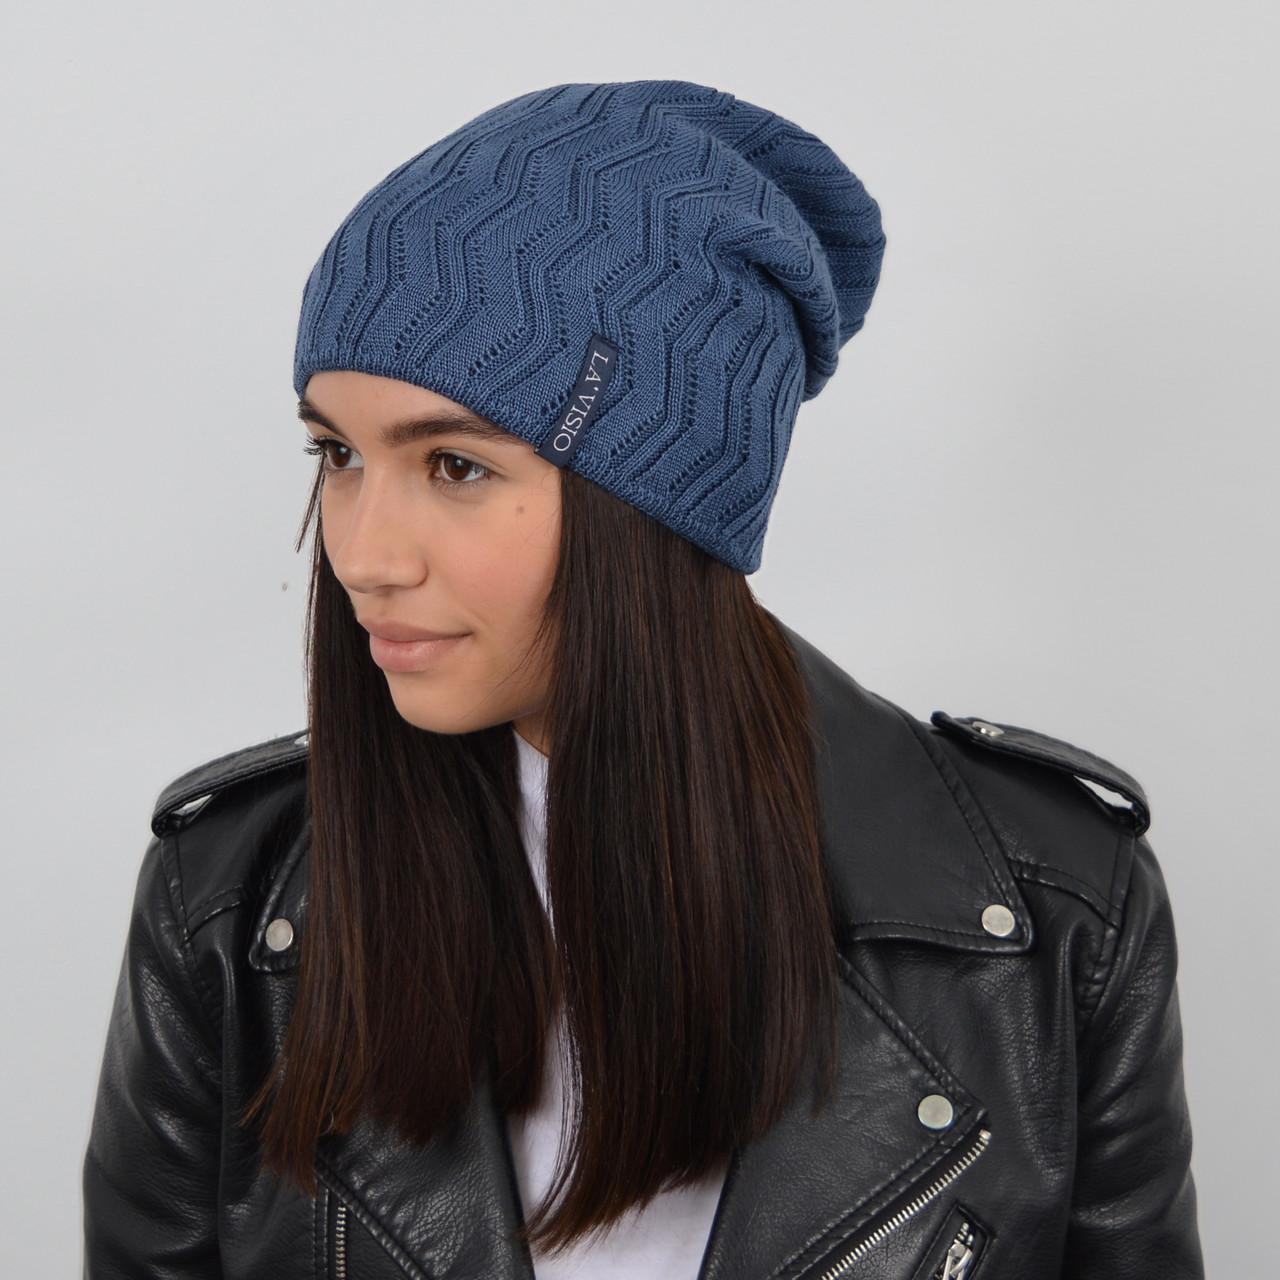 Женская шапка LaVisio (ЛаВисио) 254-219 джинс